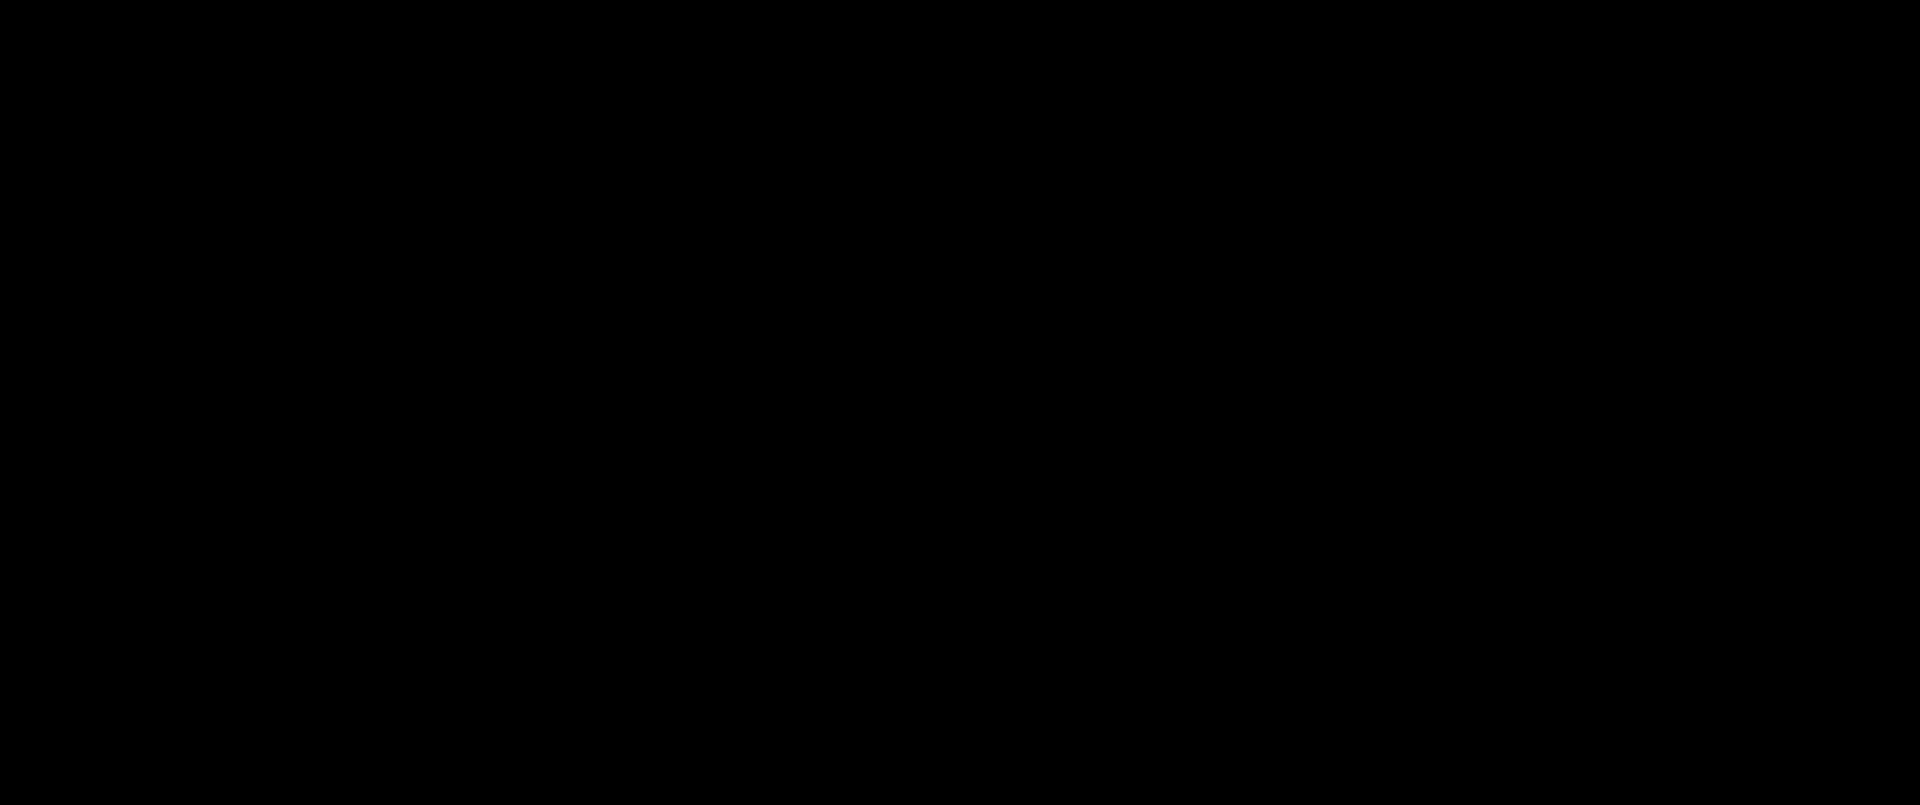 Key Difference - Imidazolidinyl Urea vs Diazolidinyl Urea